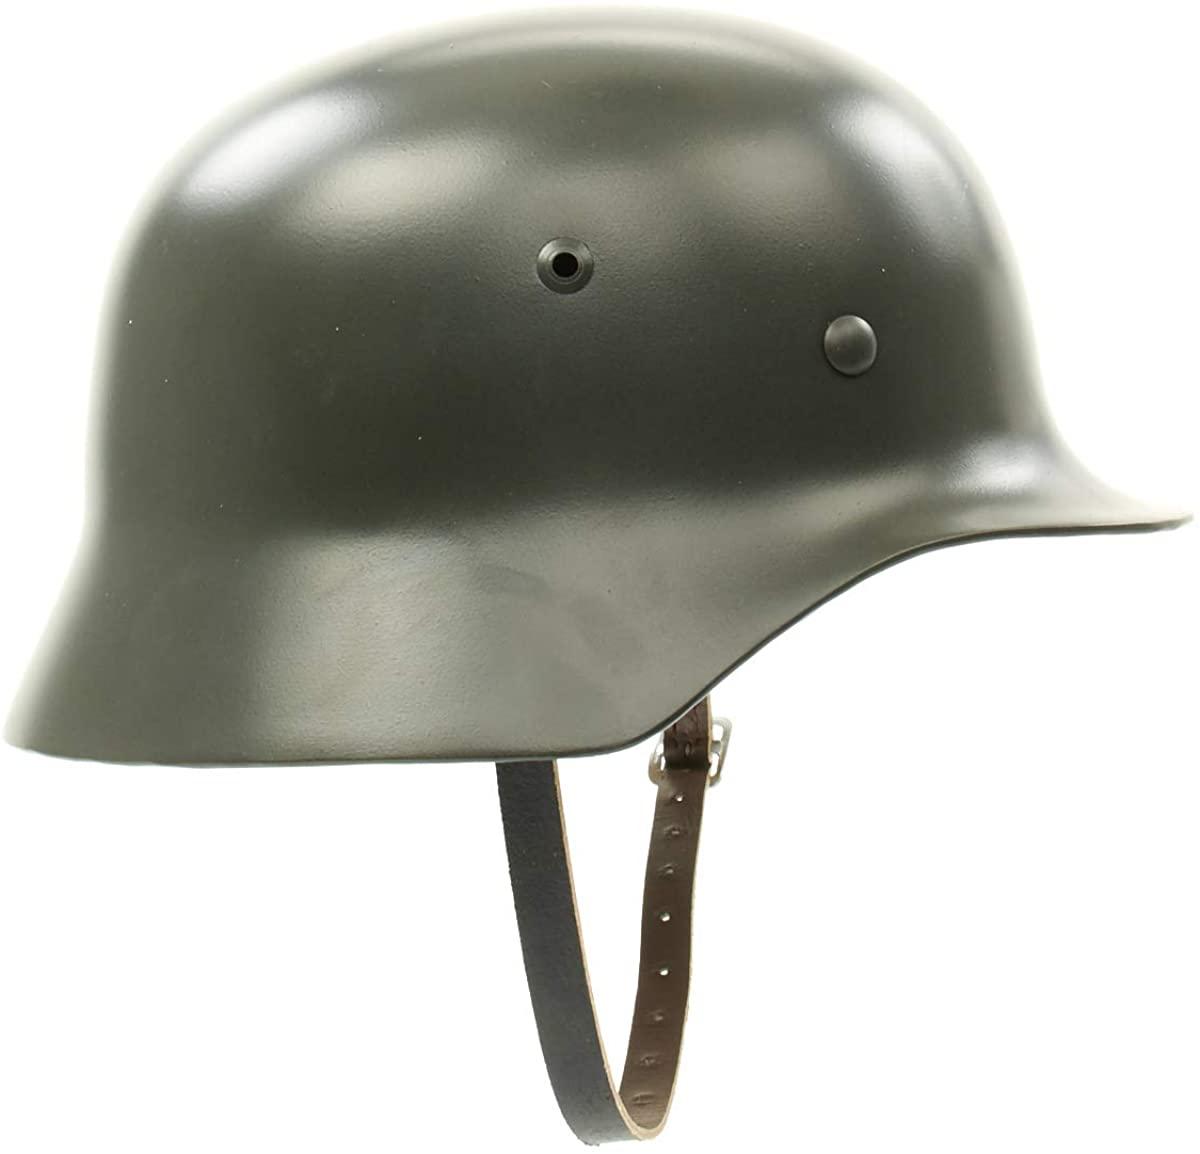 German WWII M35 Steel Helmet- Stahlhelm 35 WW2 M1935- Extra Large Shell- Size 70